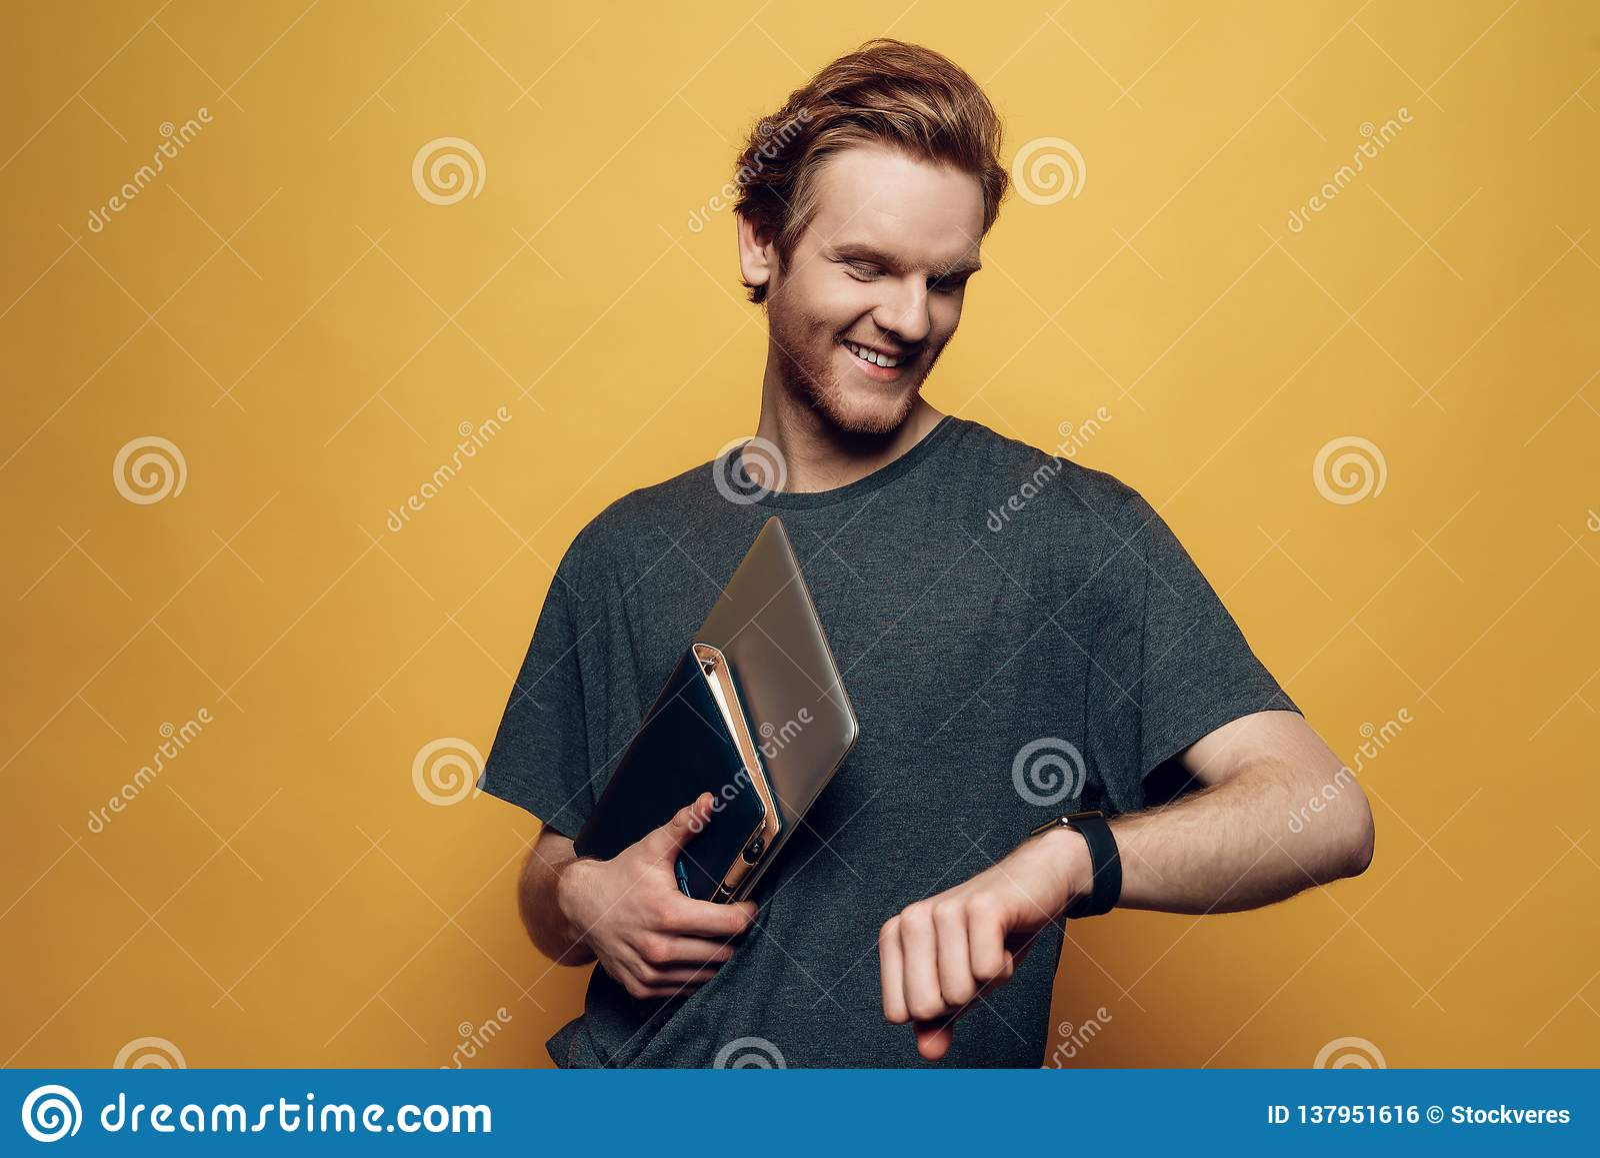 Retrato de Guy Holding Laptop joven alegre